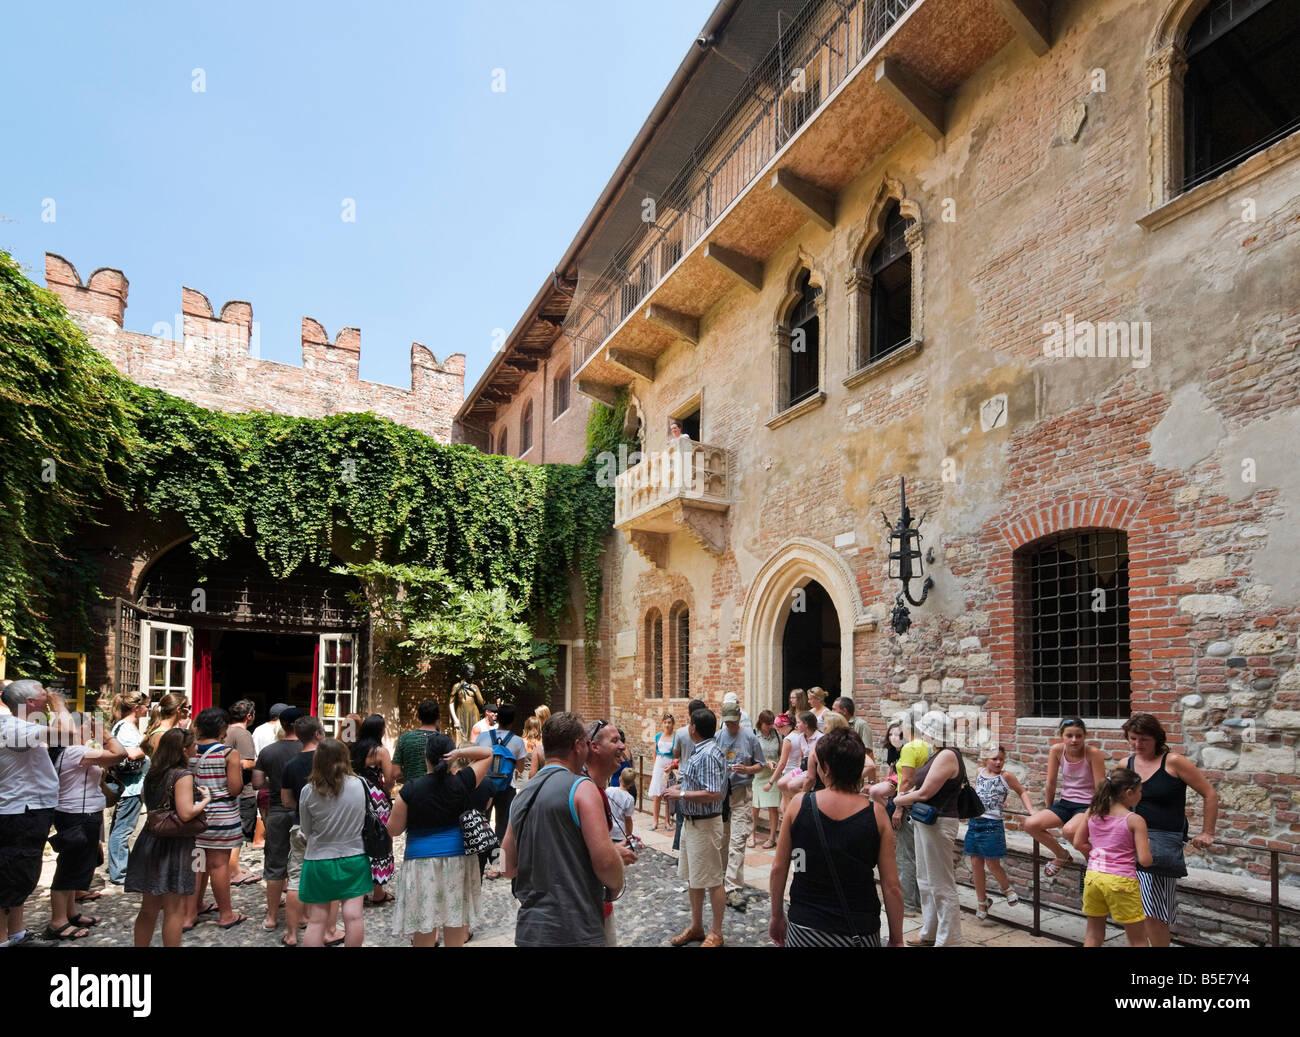 Romeo und Julia Balkon. Touristen unter dem Balkon der Casa di Giulietta (das Haus der Julia), Via Cappello, Verona, Stockbild